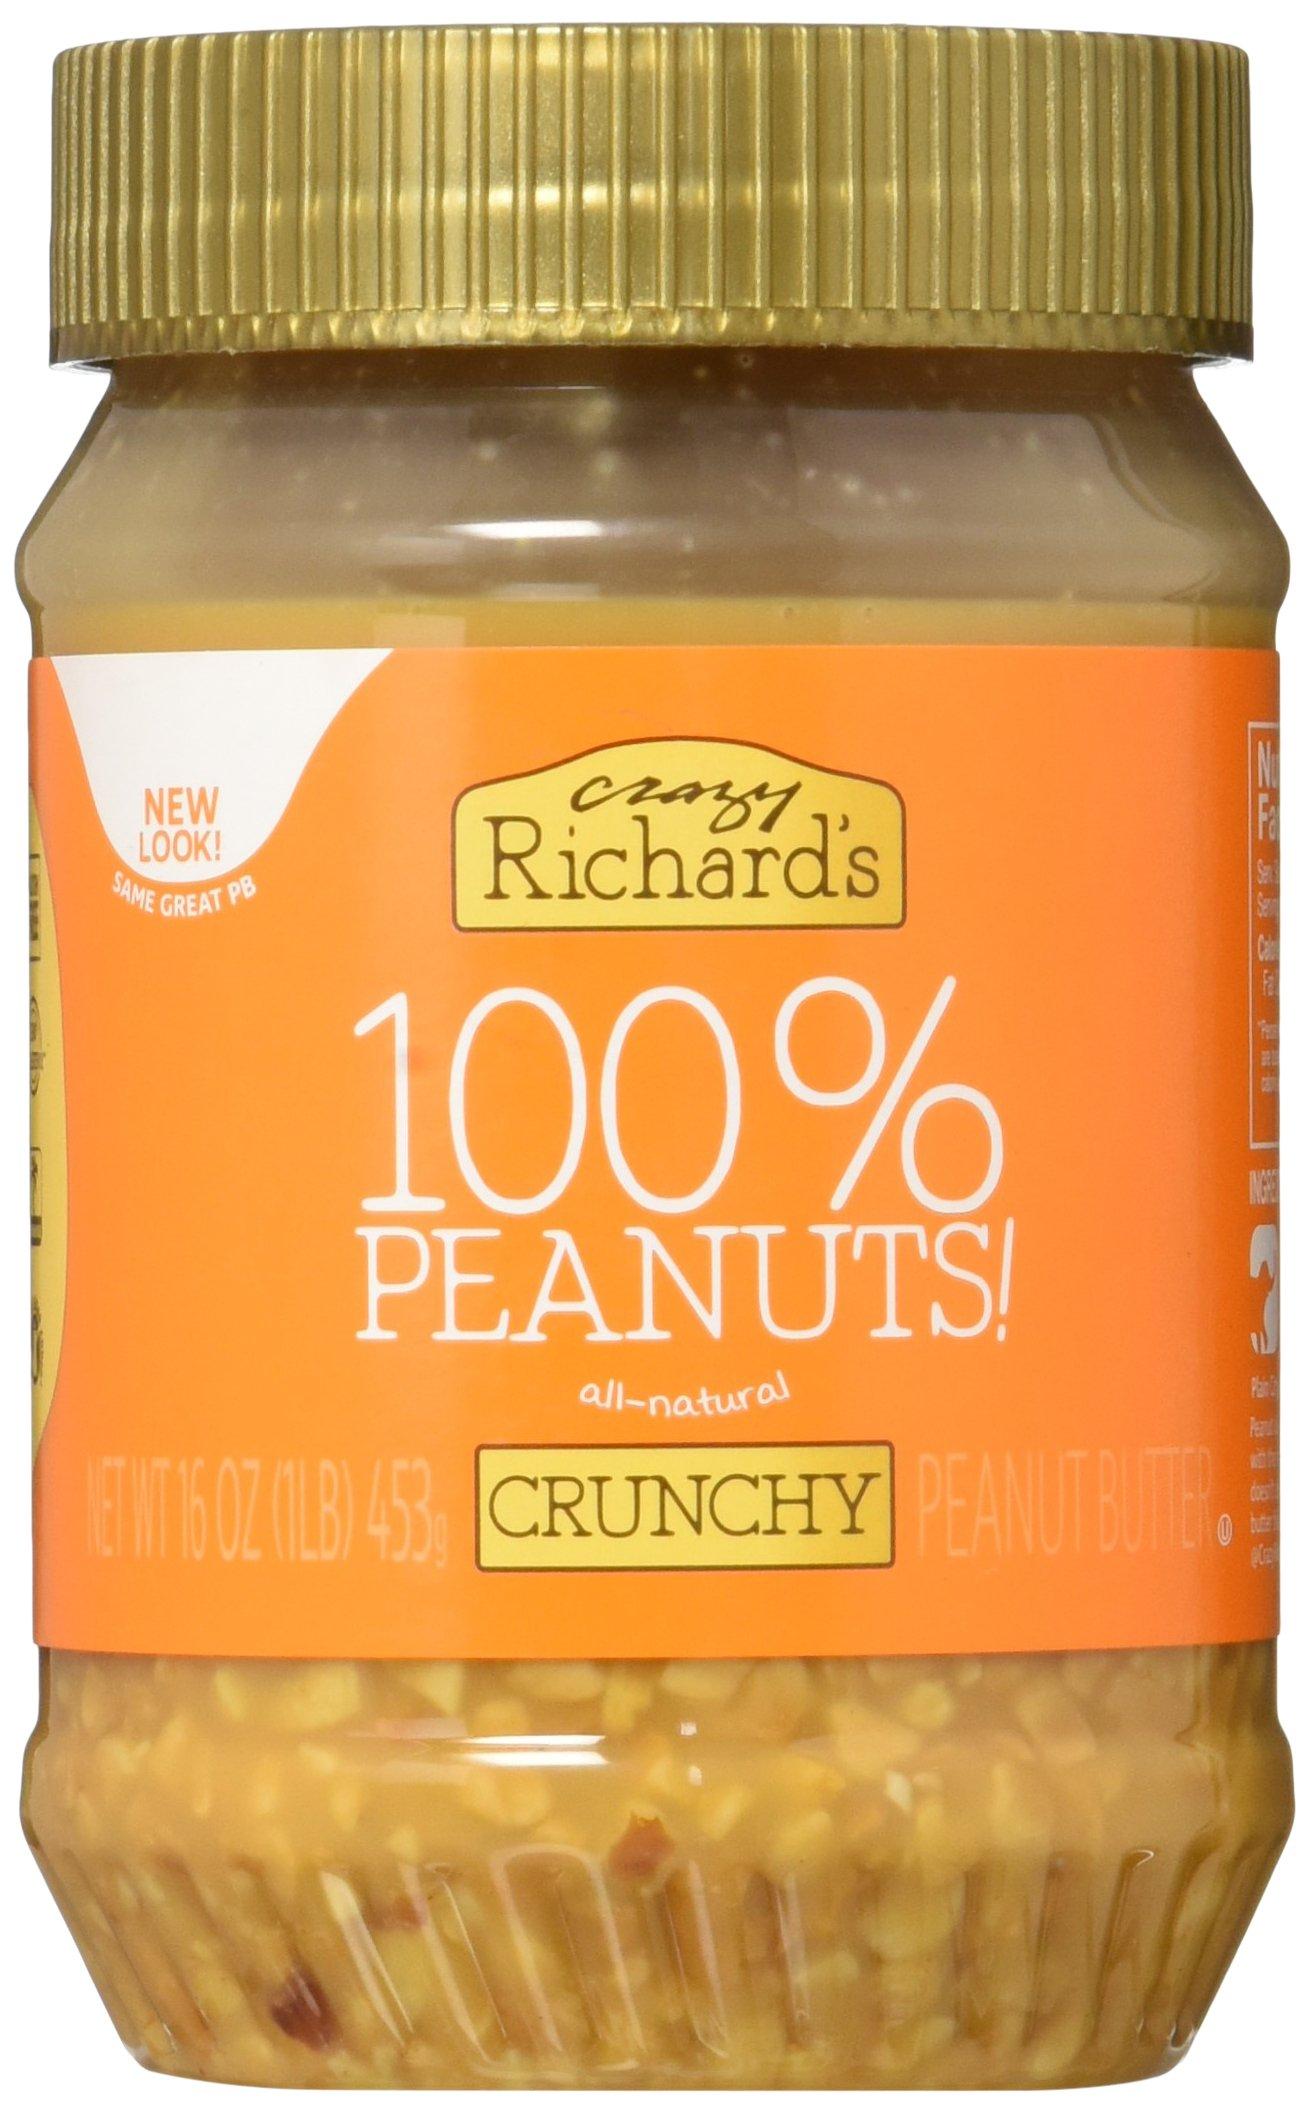 Crazy Richards 100% Natural Crunchy Peanut Butter - 16oz Jar